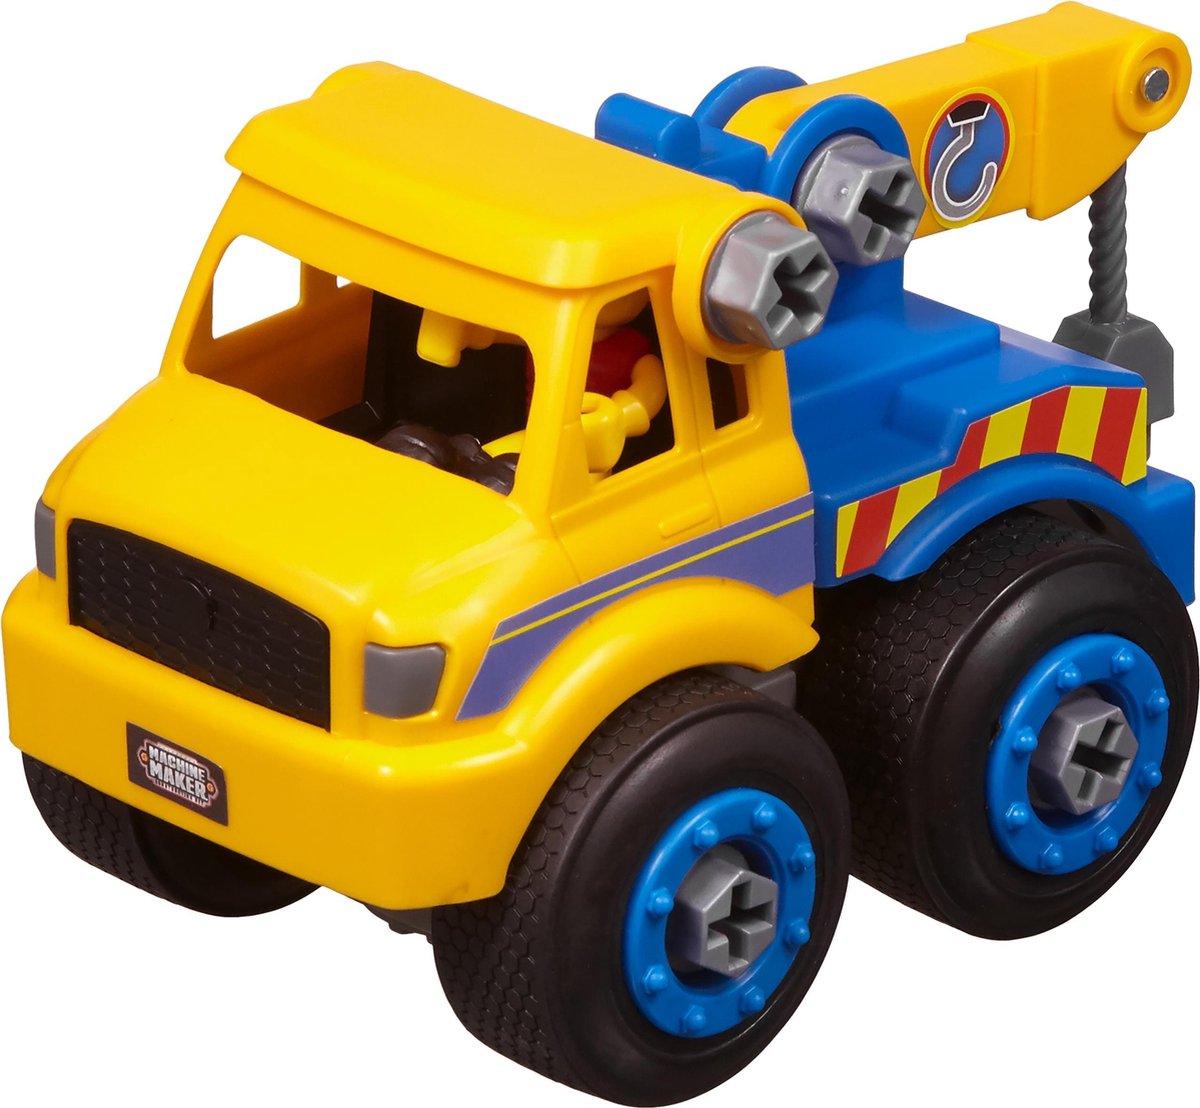 Nikko - Machine Maker Auto City Service: sleepwagen 9-delig